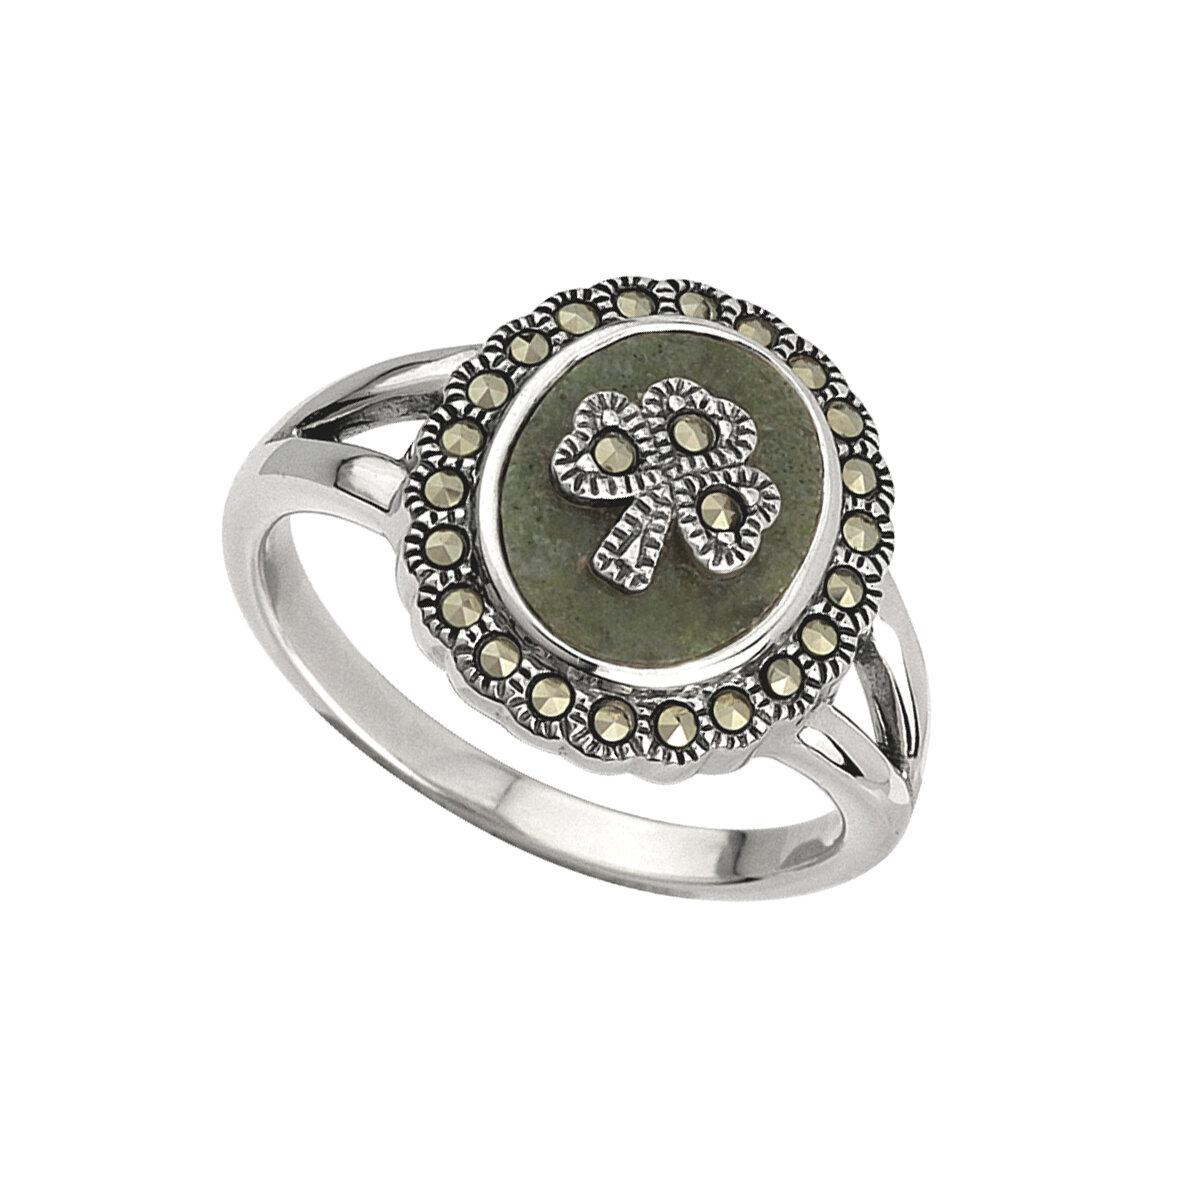 sterling silver marcasite shamrock connemara marble ring s2824 from Solvar